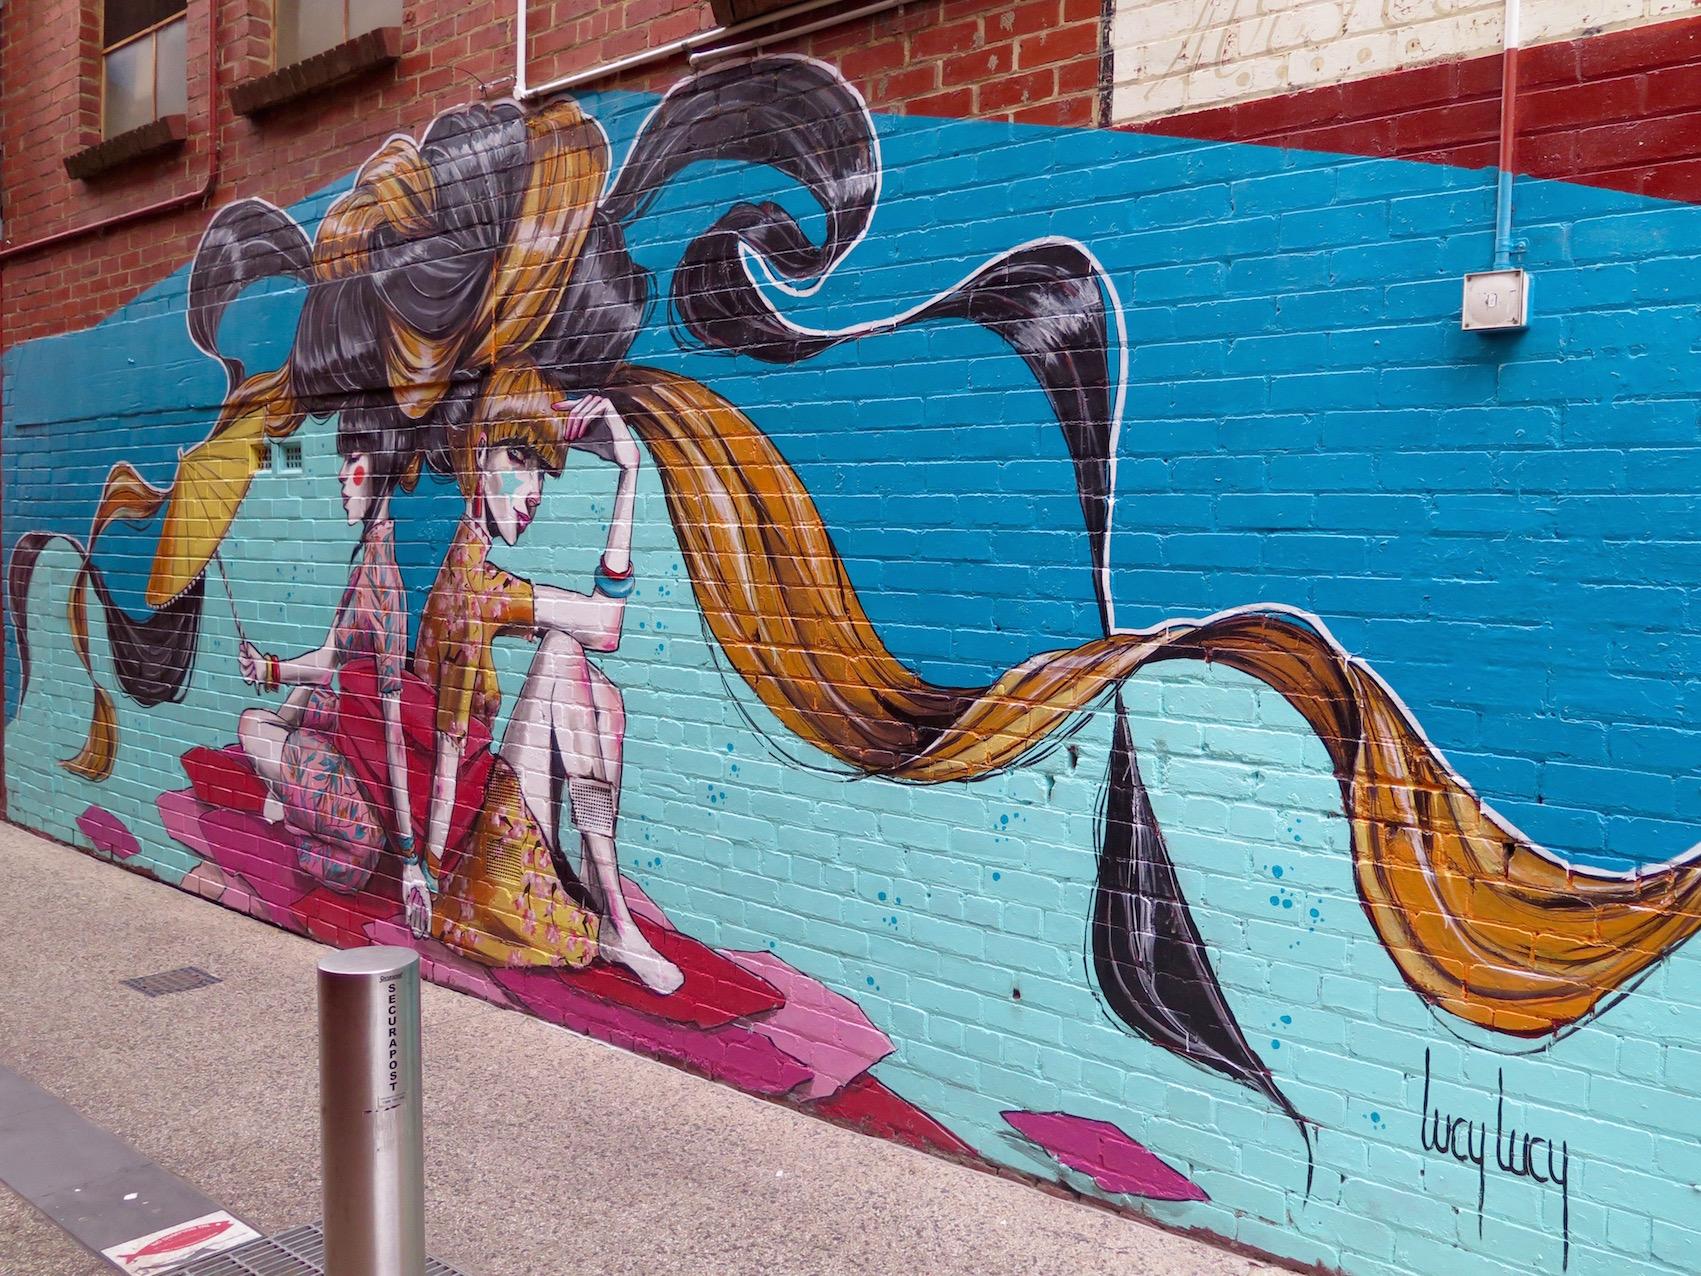 deansunshine_landofsunshine_melbourne_streetart_graffiti_invurt top ten 62 4 Lucy Lucy 4